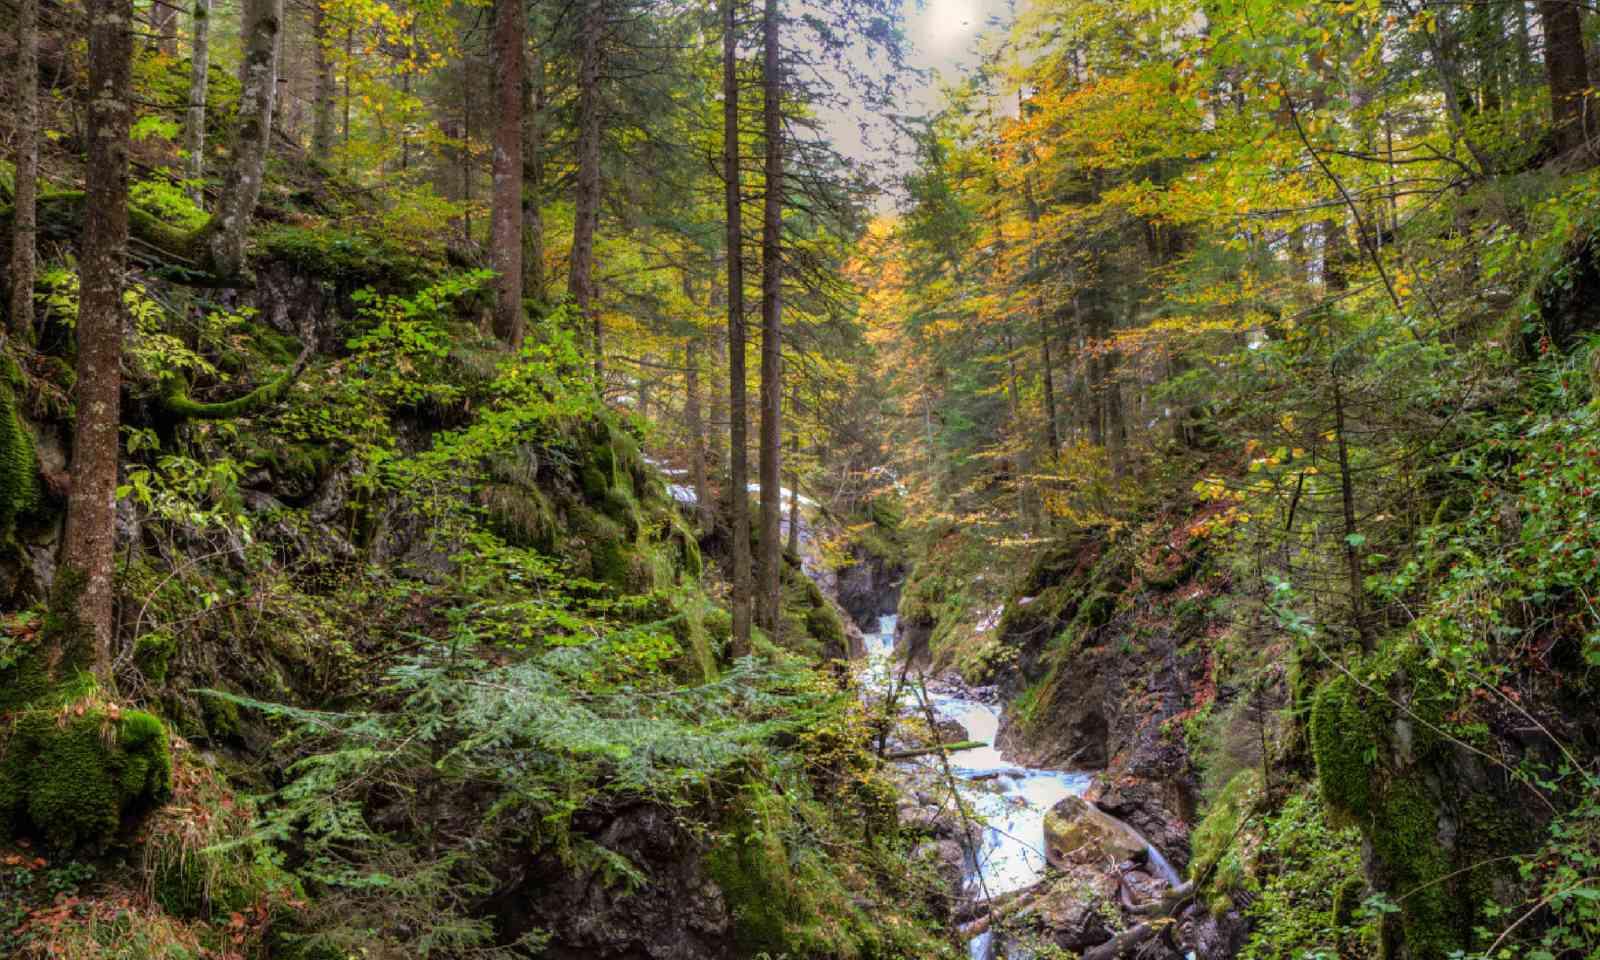 Canyon in Brandnertal valley (Shutterstock)